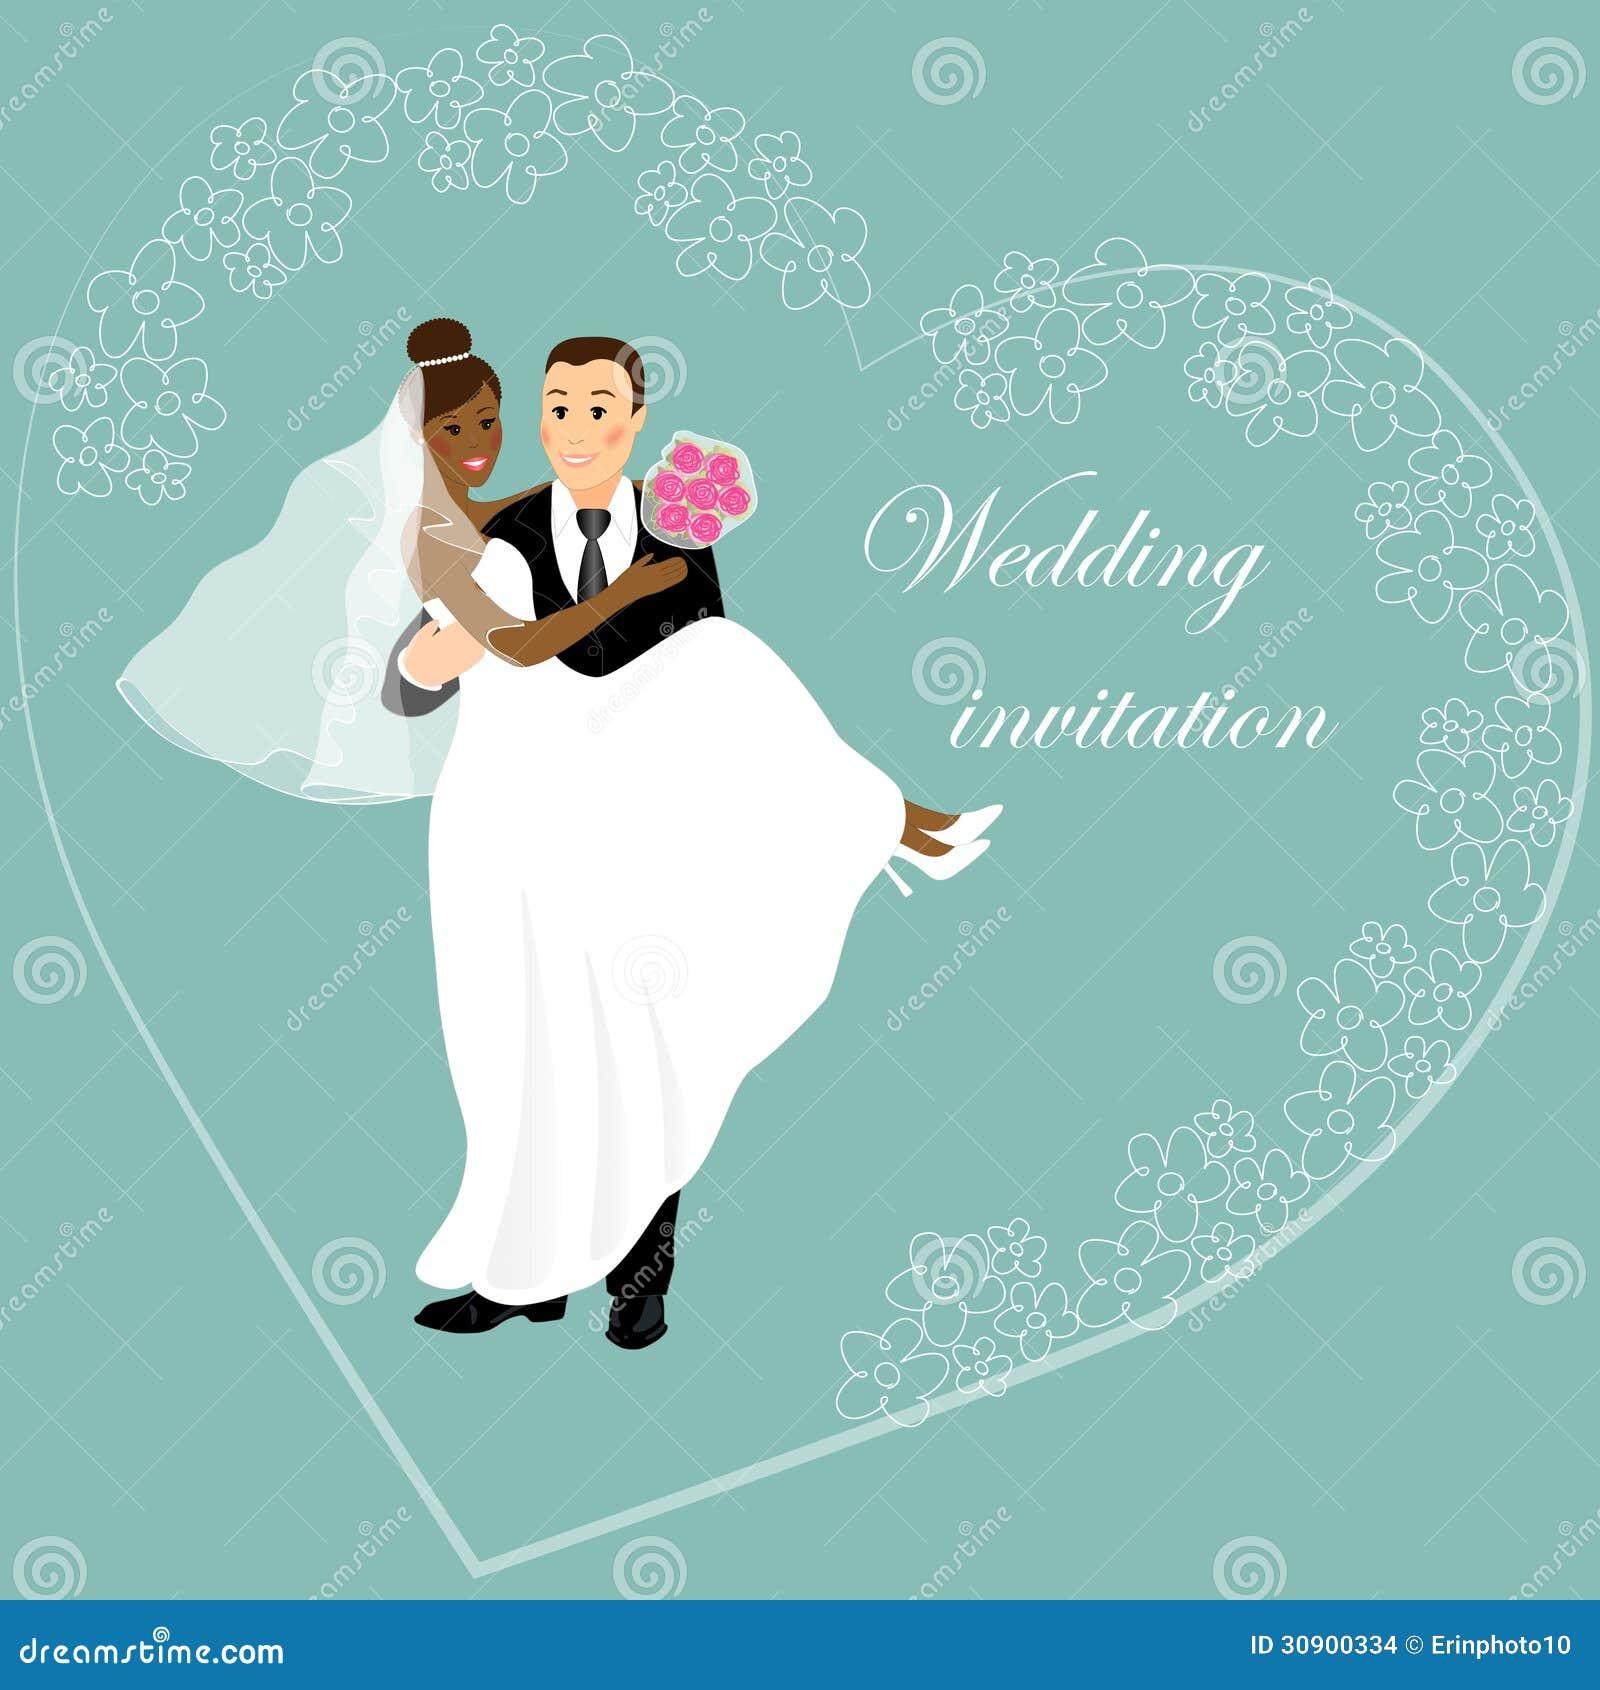 Wedding card 1 stock illustration. Illustration of hugging - 30900334